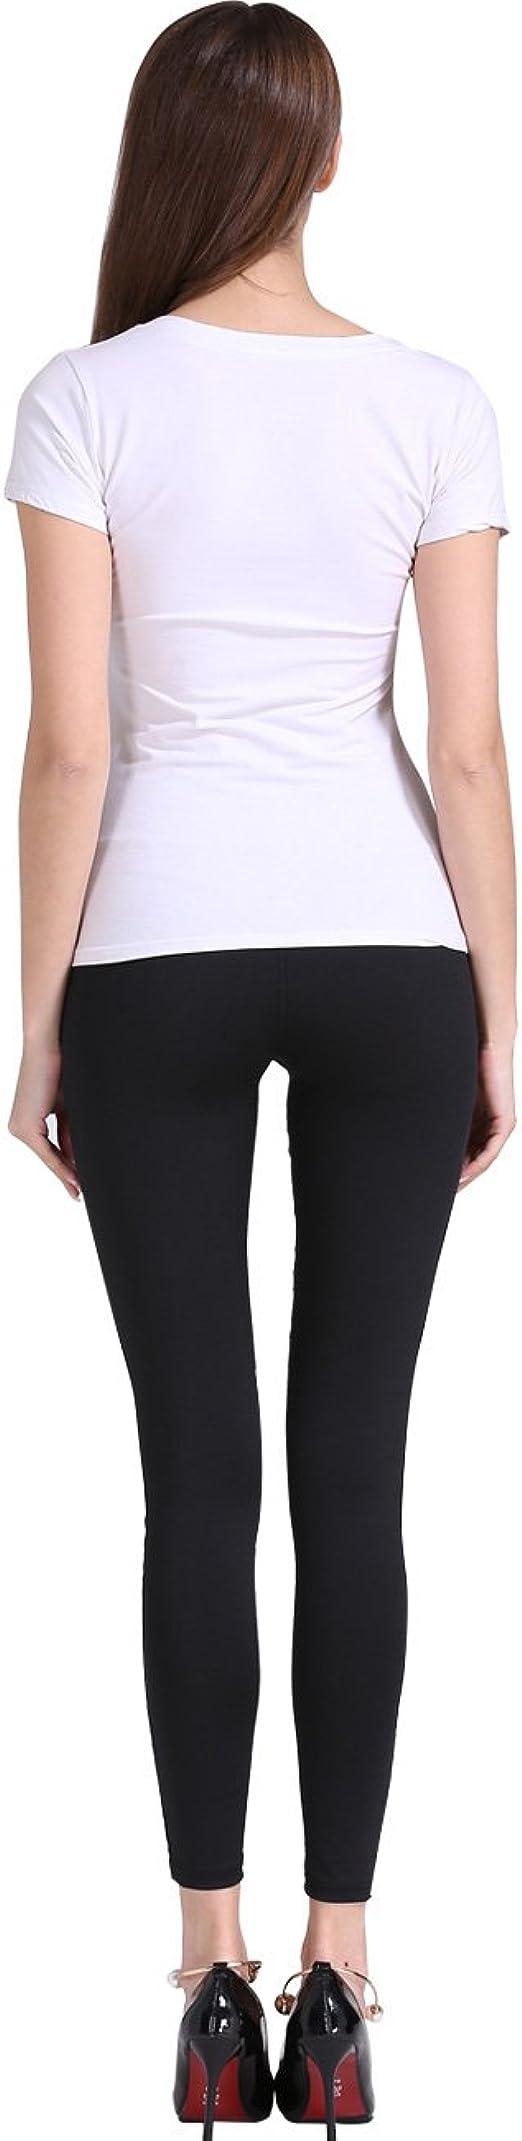 Everbellus Womens Tummy Control Workout Leggings High Waist Yoga Running Pants Black